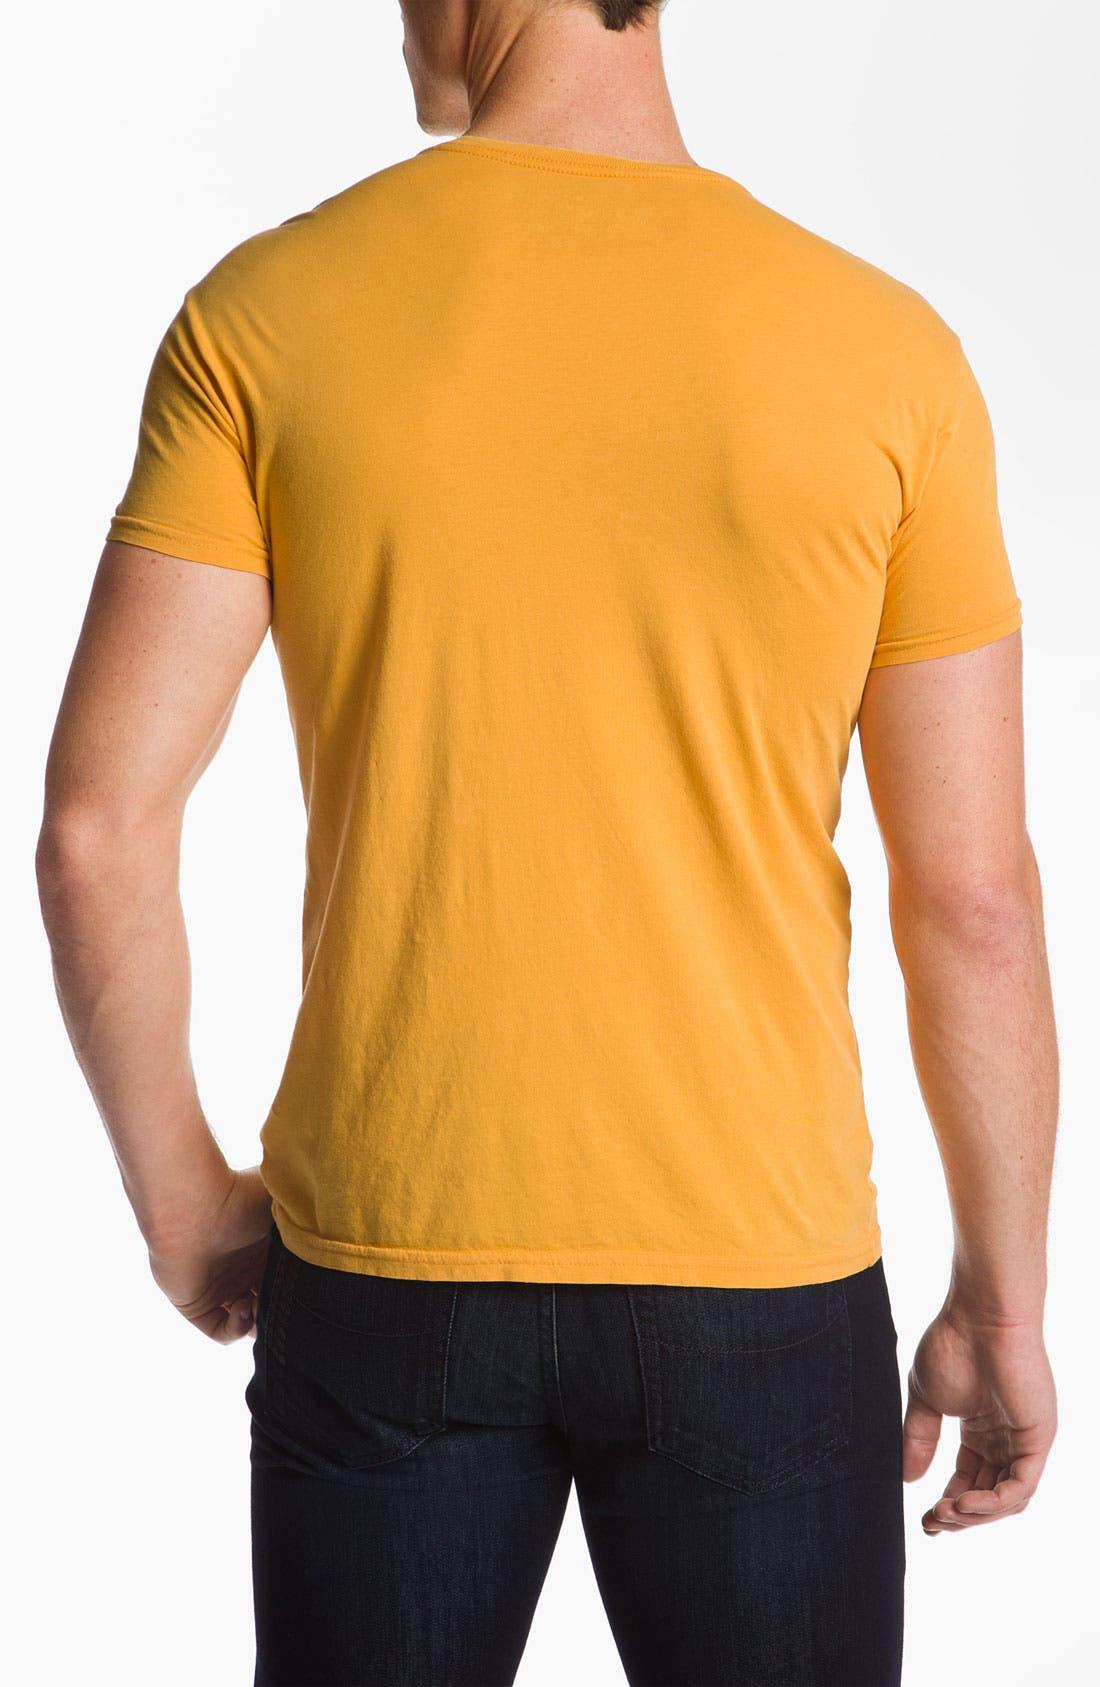 Alternate Image 2  - The Original Retro Brand 'Florida State Seminoles' T-Shirt